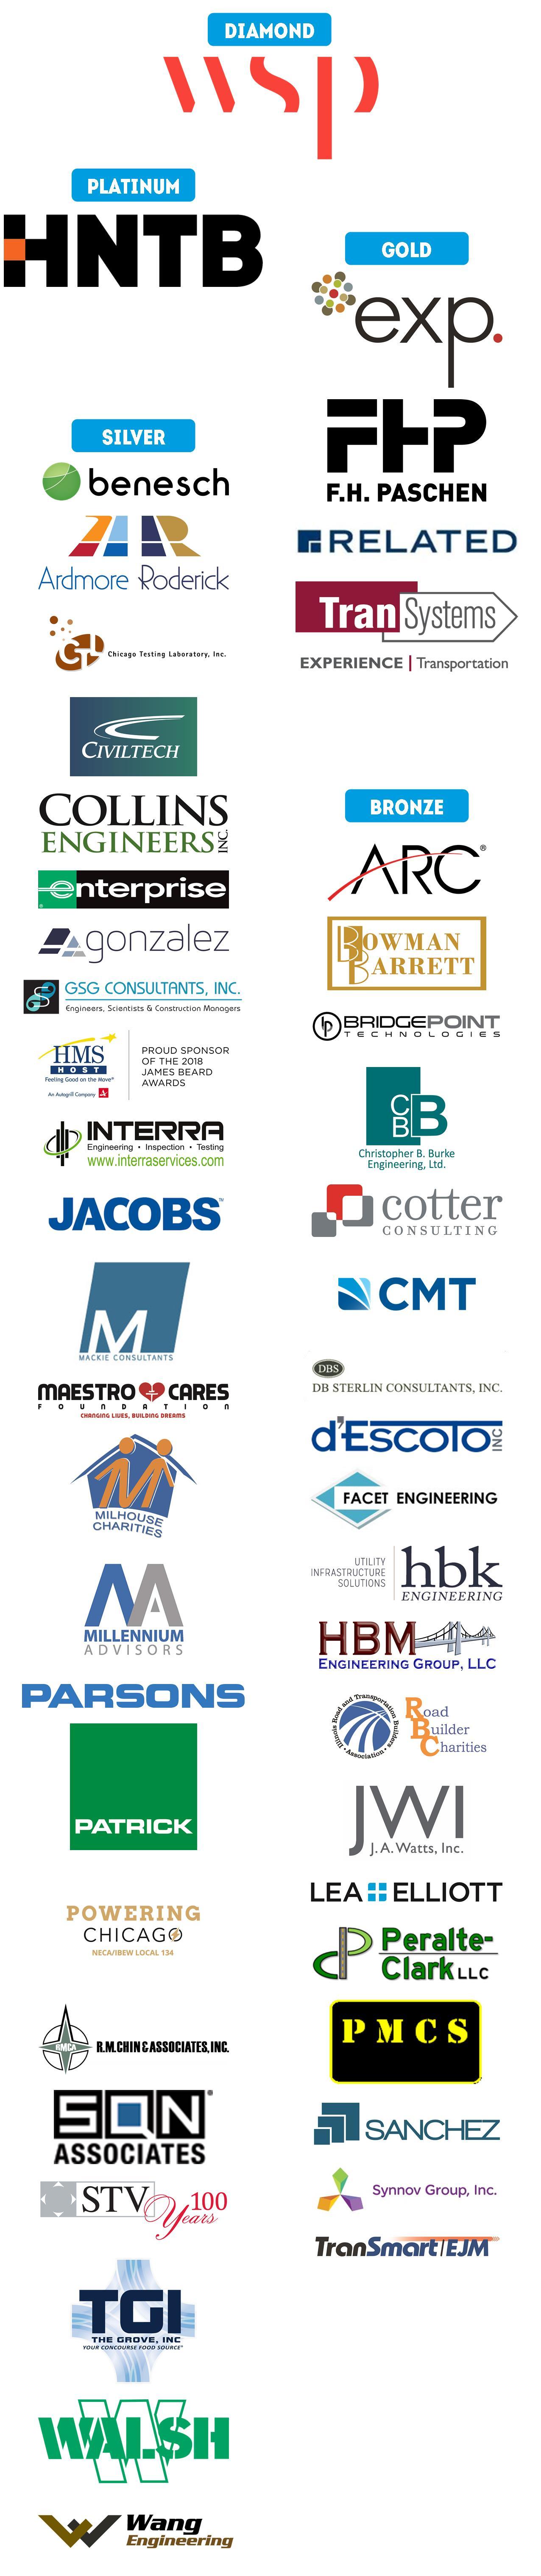 Sponsor List 9-22-18